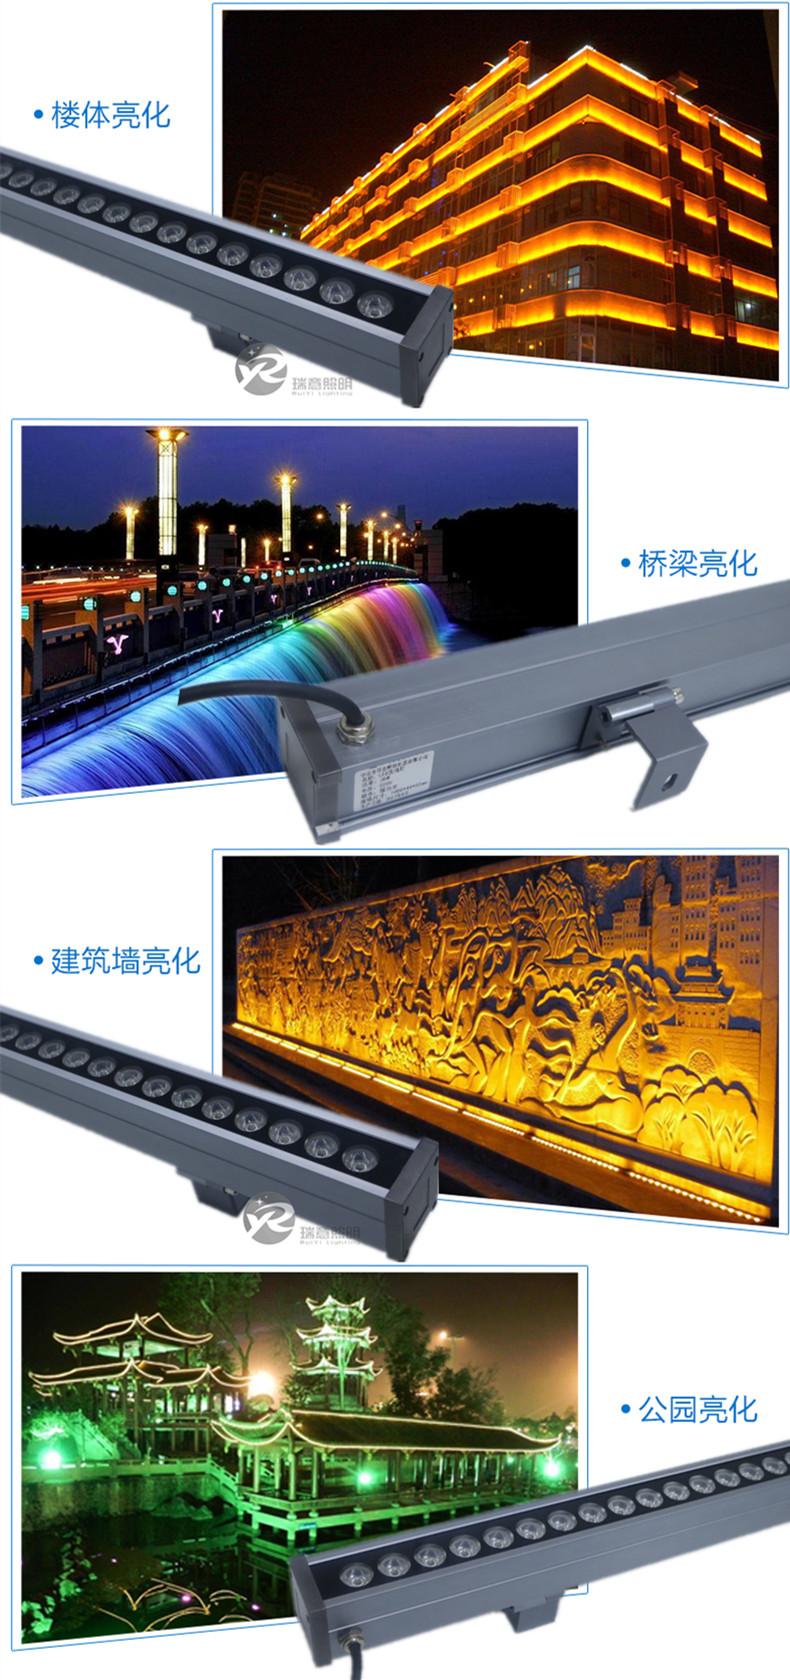 36W私模新款LED洗墙灯48*55应用图